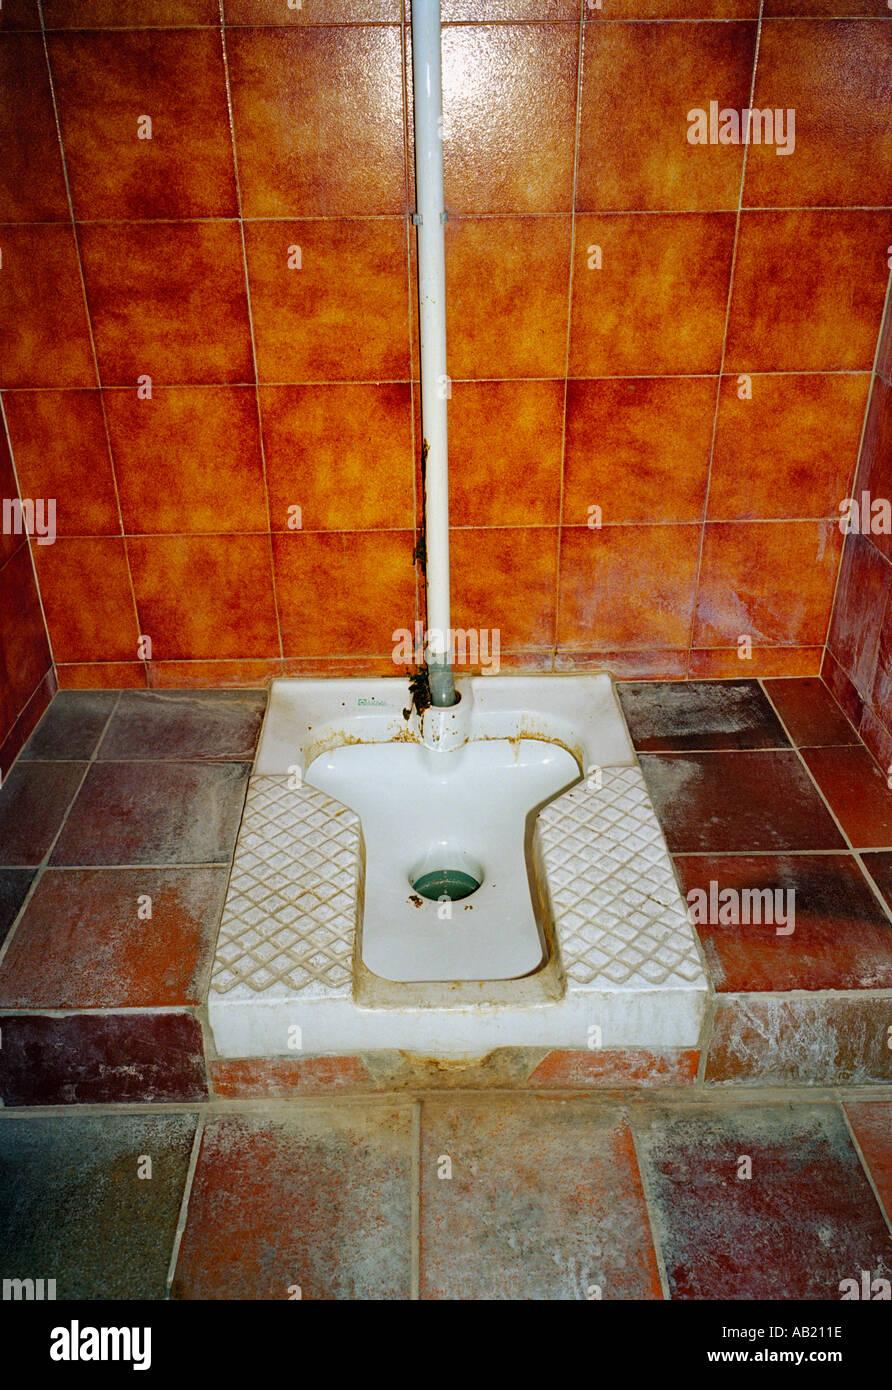 Toilette Turque Photos & Toilette Turque Images - Alamy